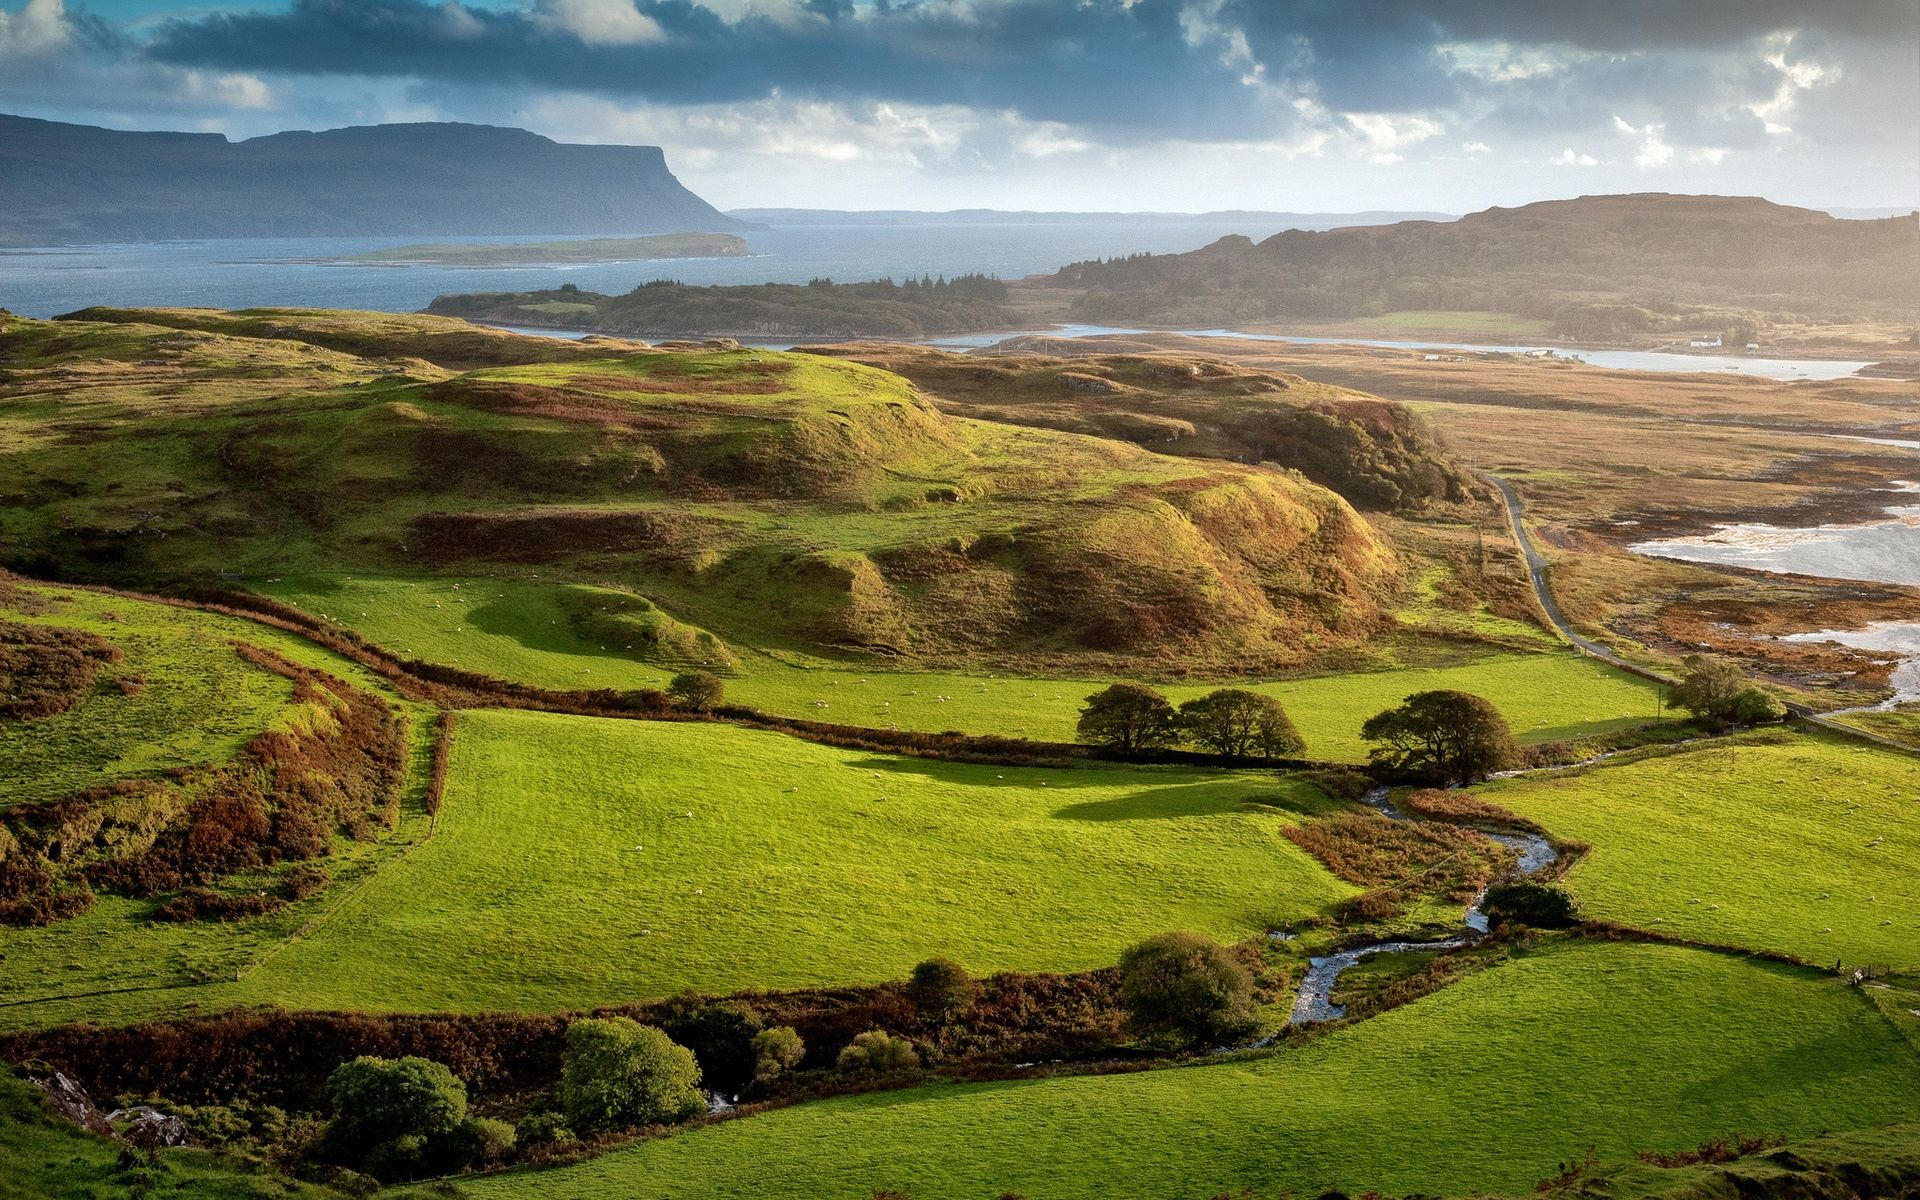 Scotland Wallpaper Scotland Landscape British Countryside Sea To Sky Highway